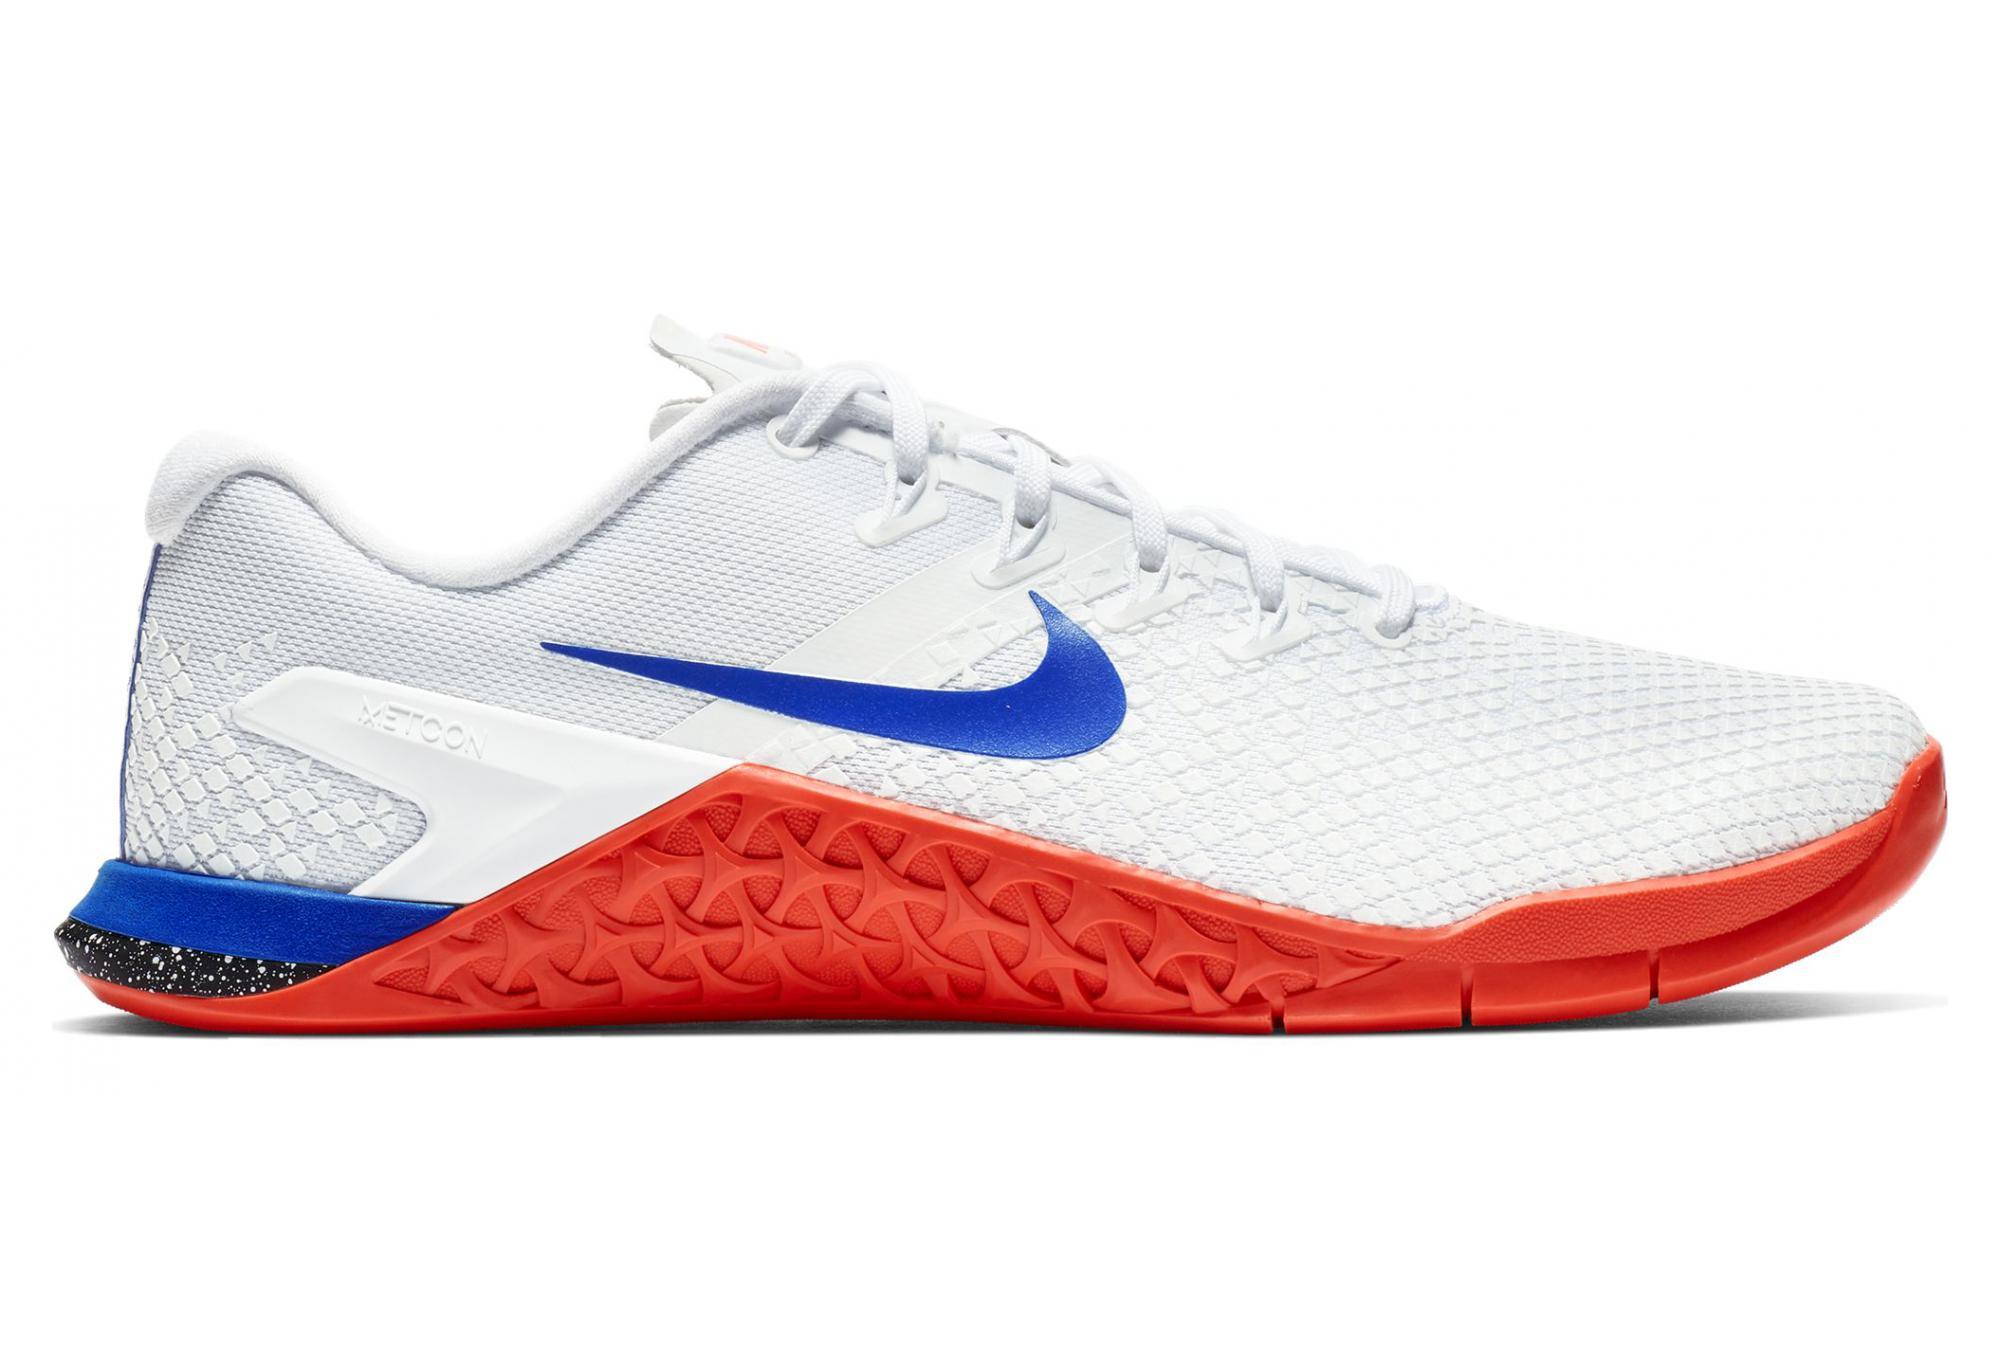 low cost 70f3b 7280d Chaussures de Cross Training Femme Nike Metcon 4 XD Blanc  Bleu  Rouge